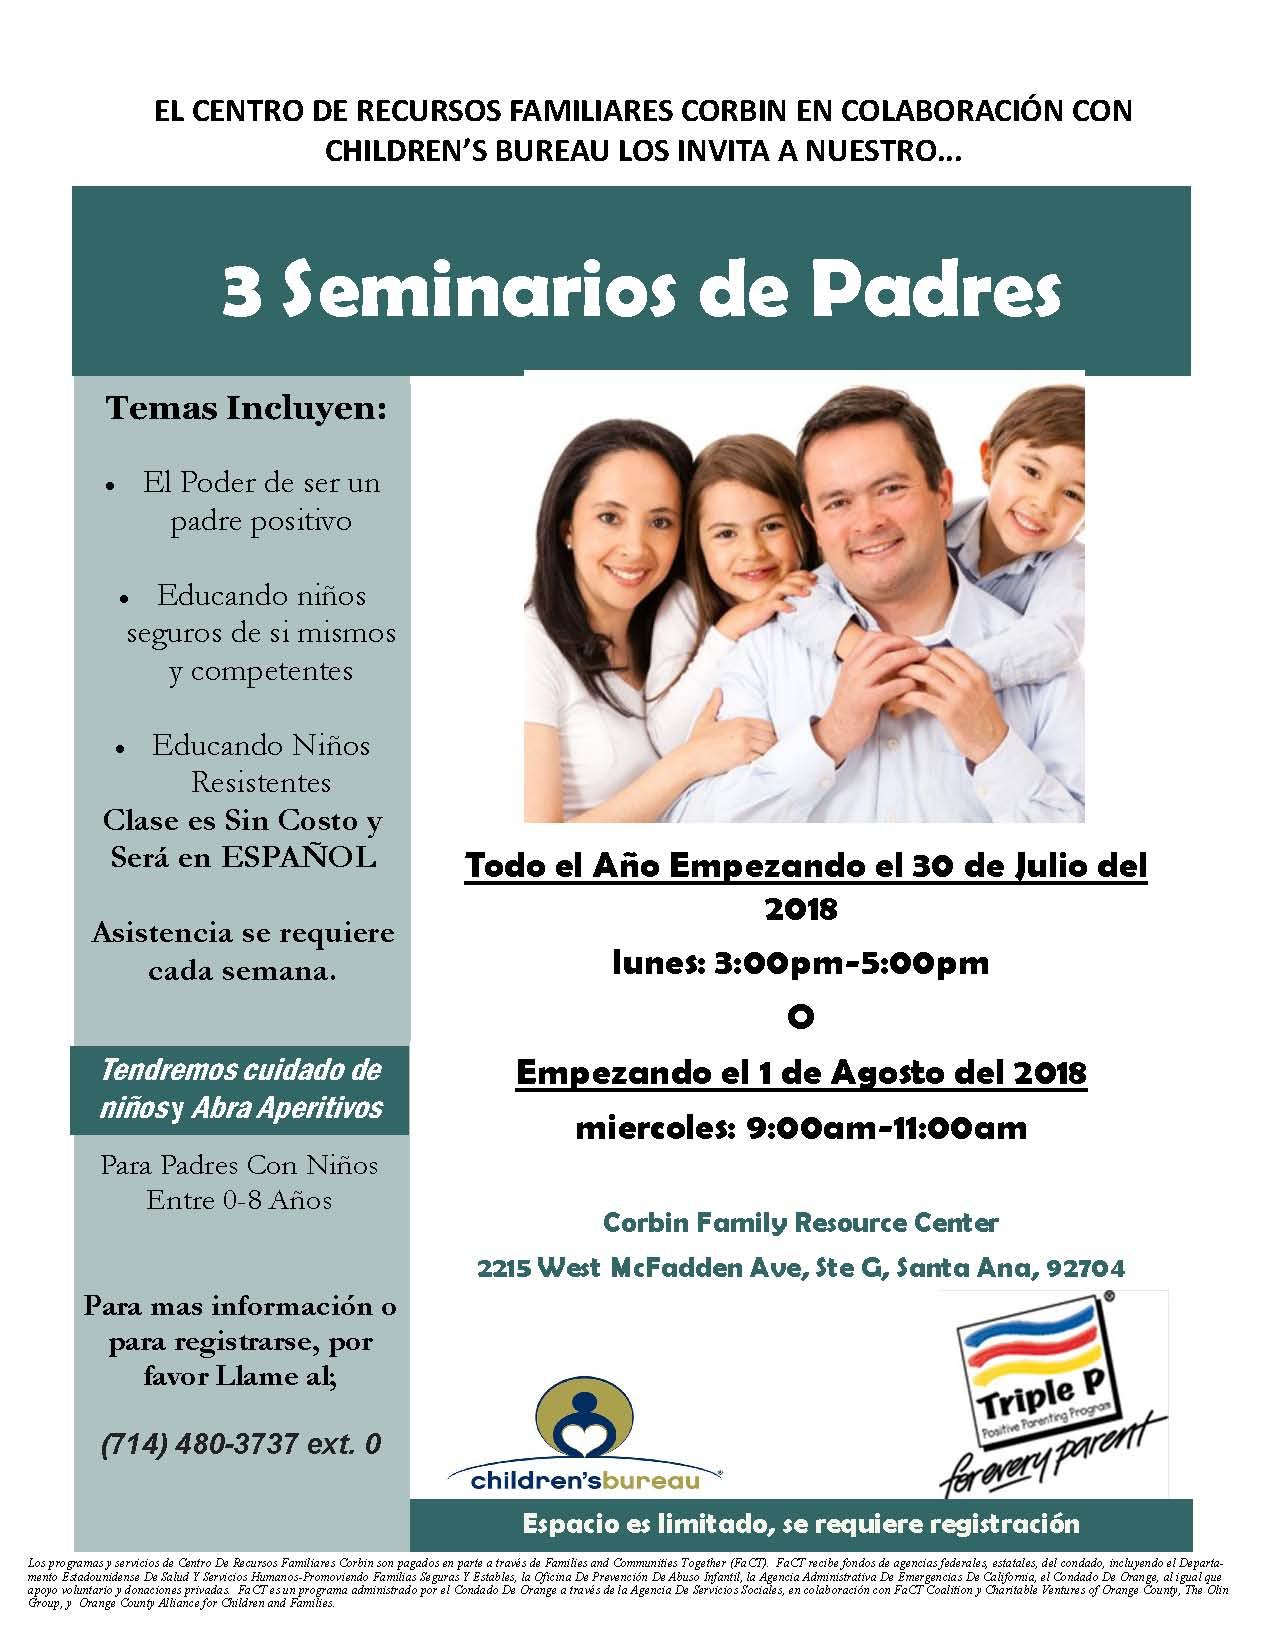 Corbin- Parenting (Triple P)- Bilingual